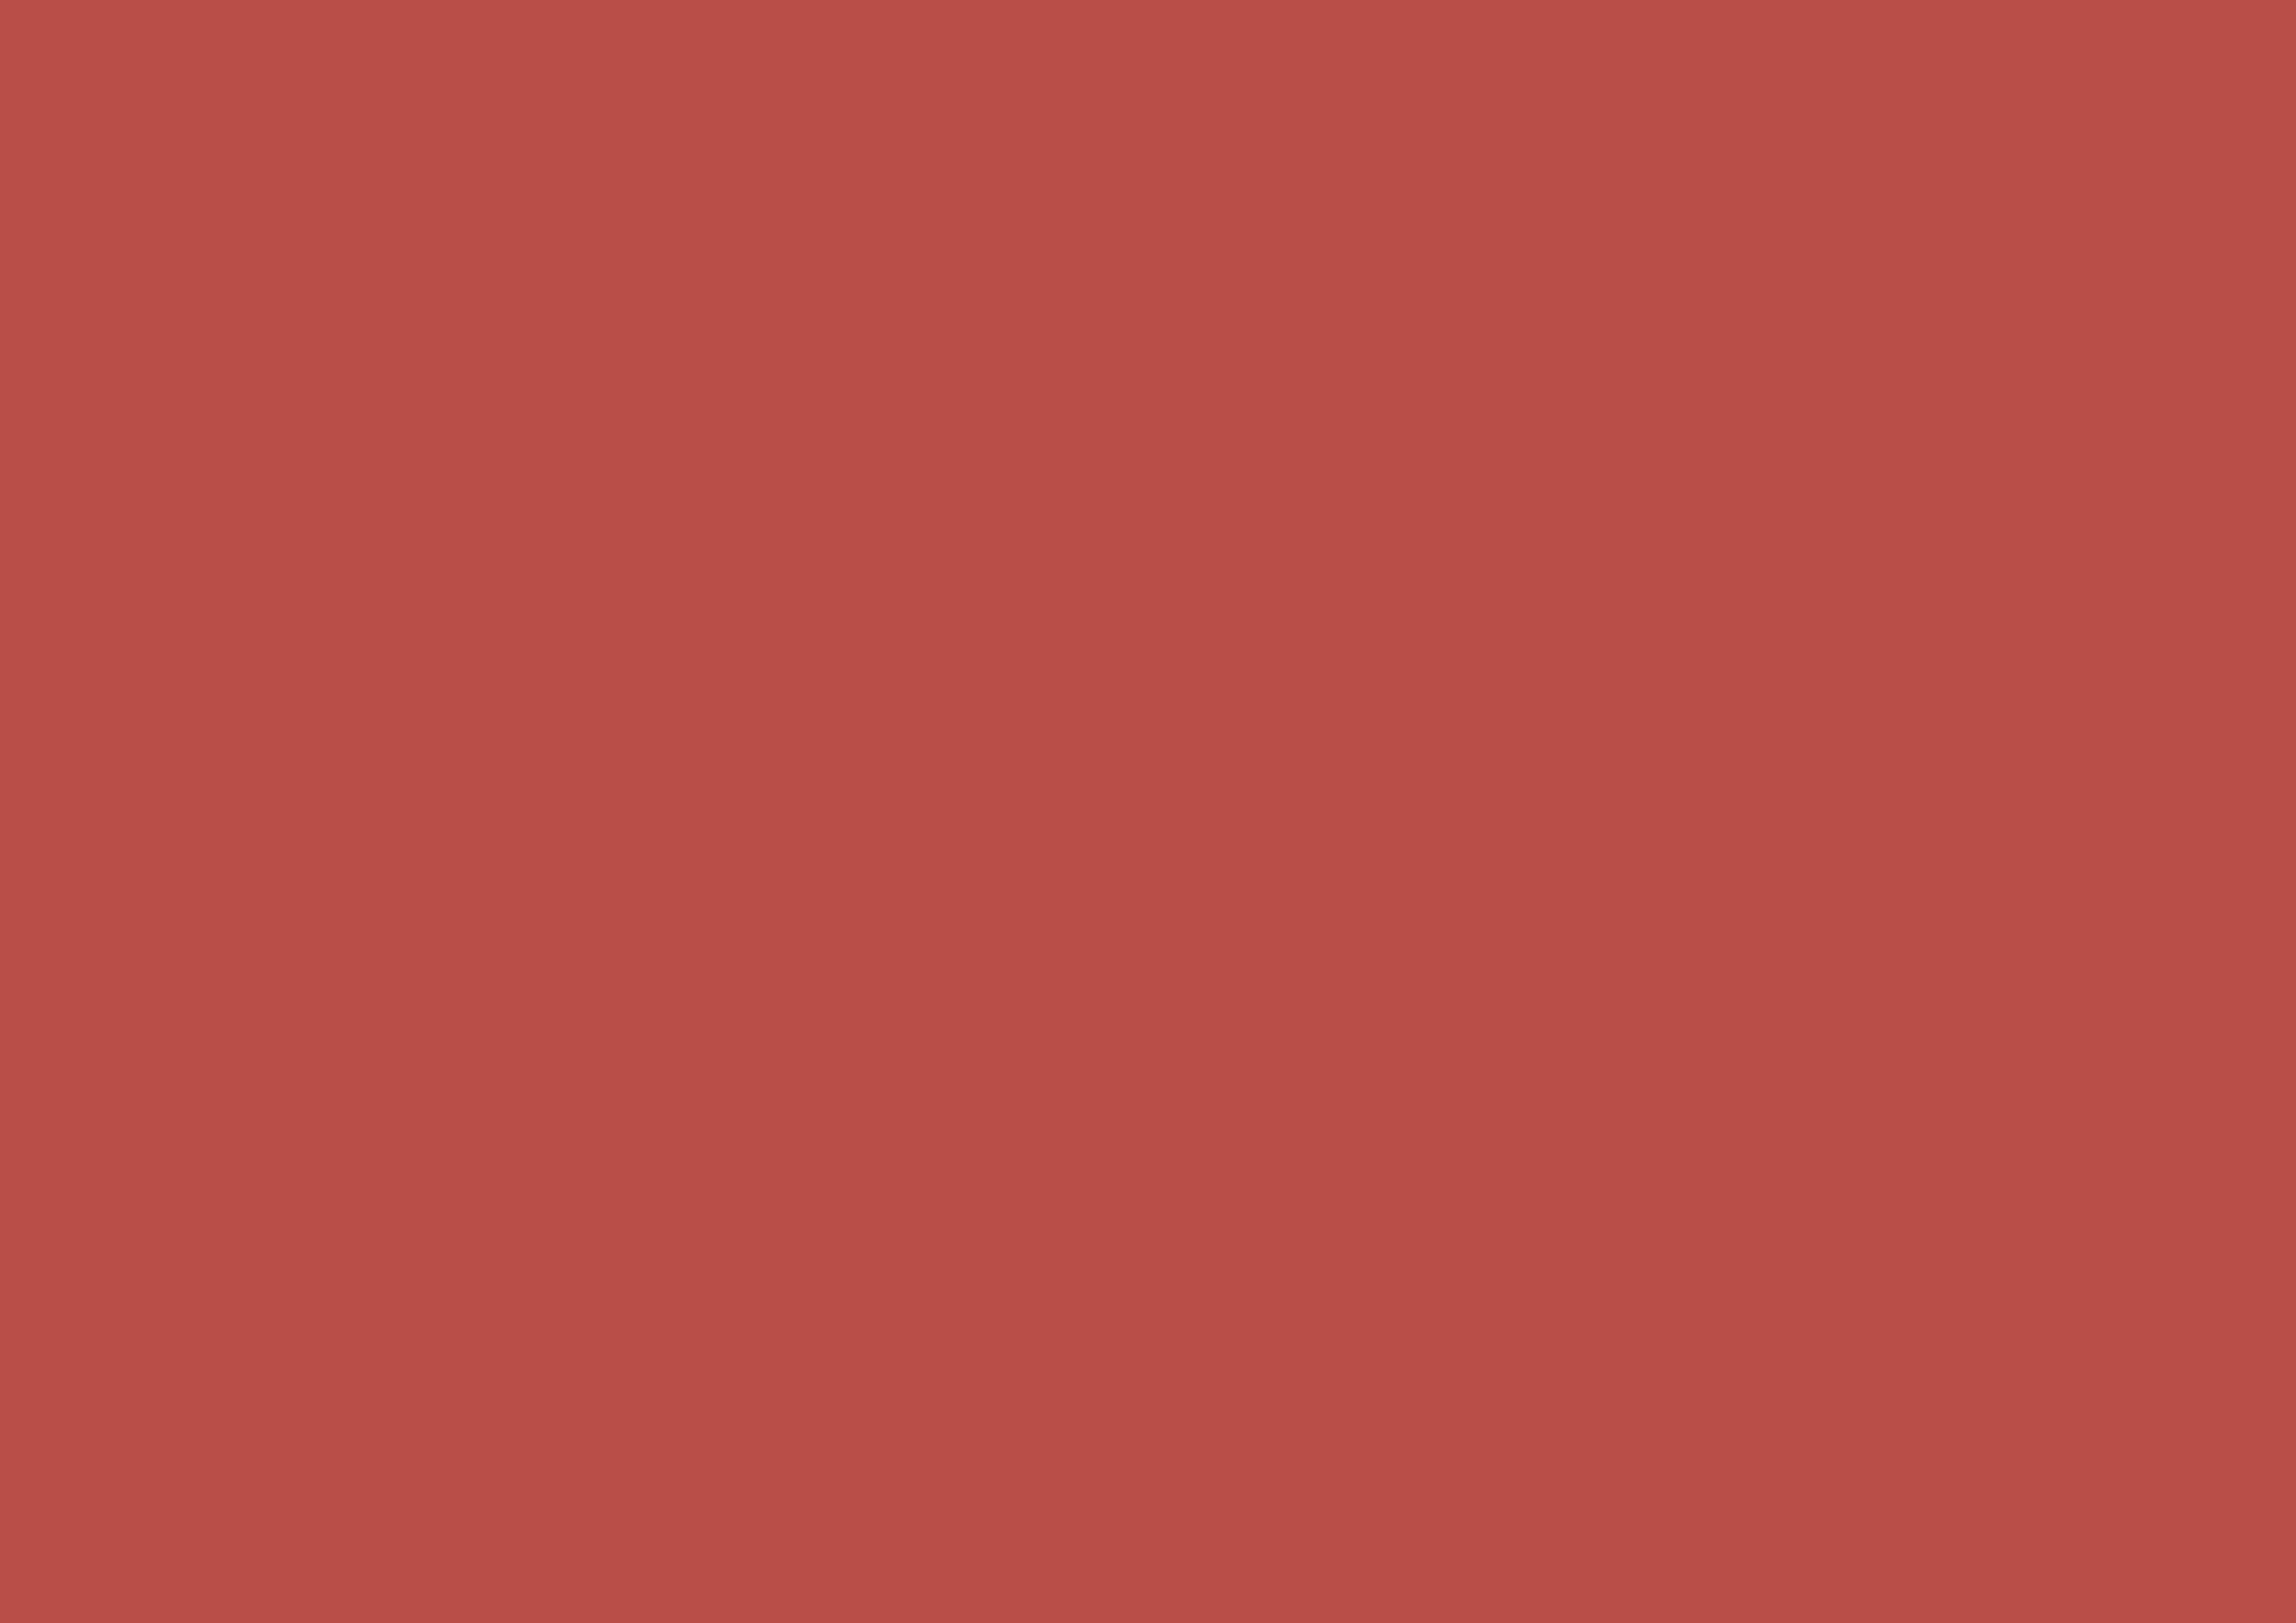 3508x2480 Deep Chestnut Solid Color Background